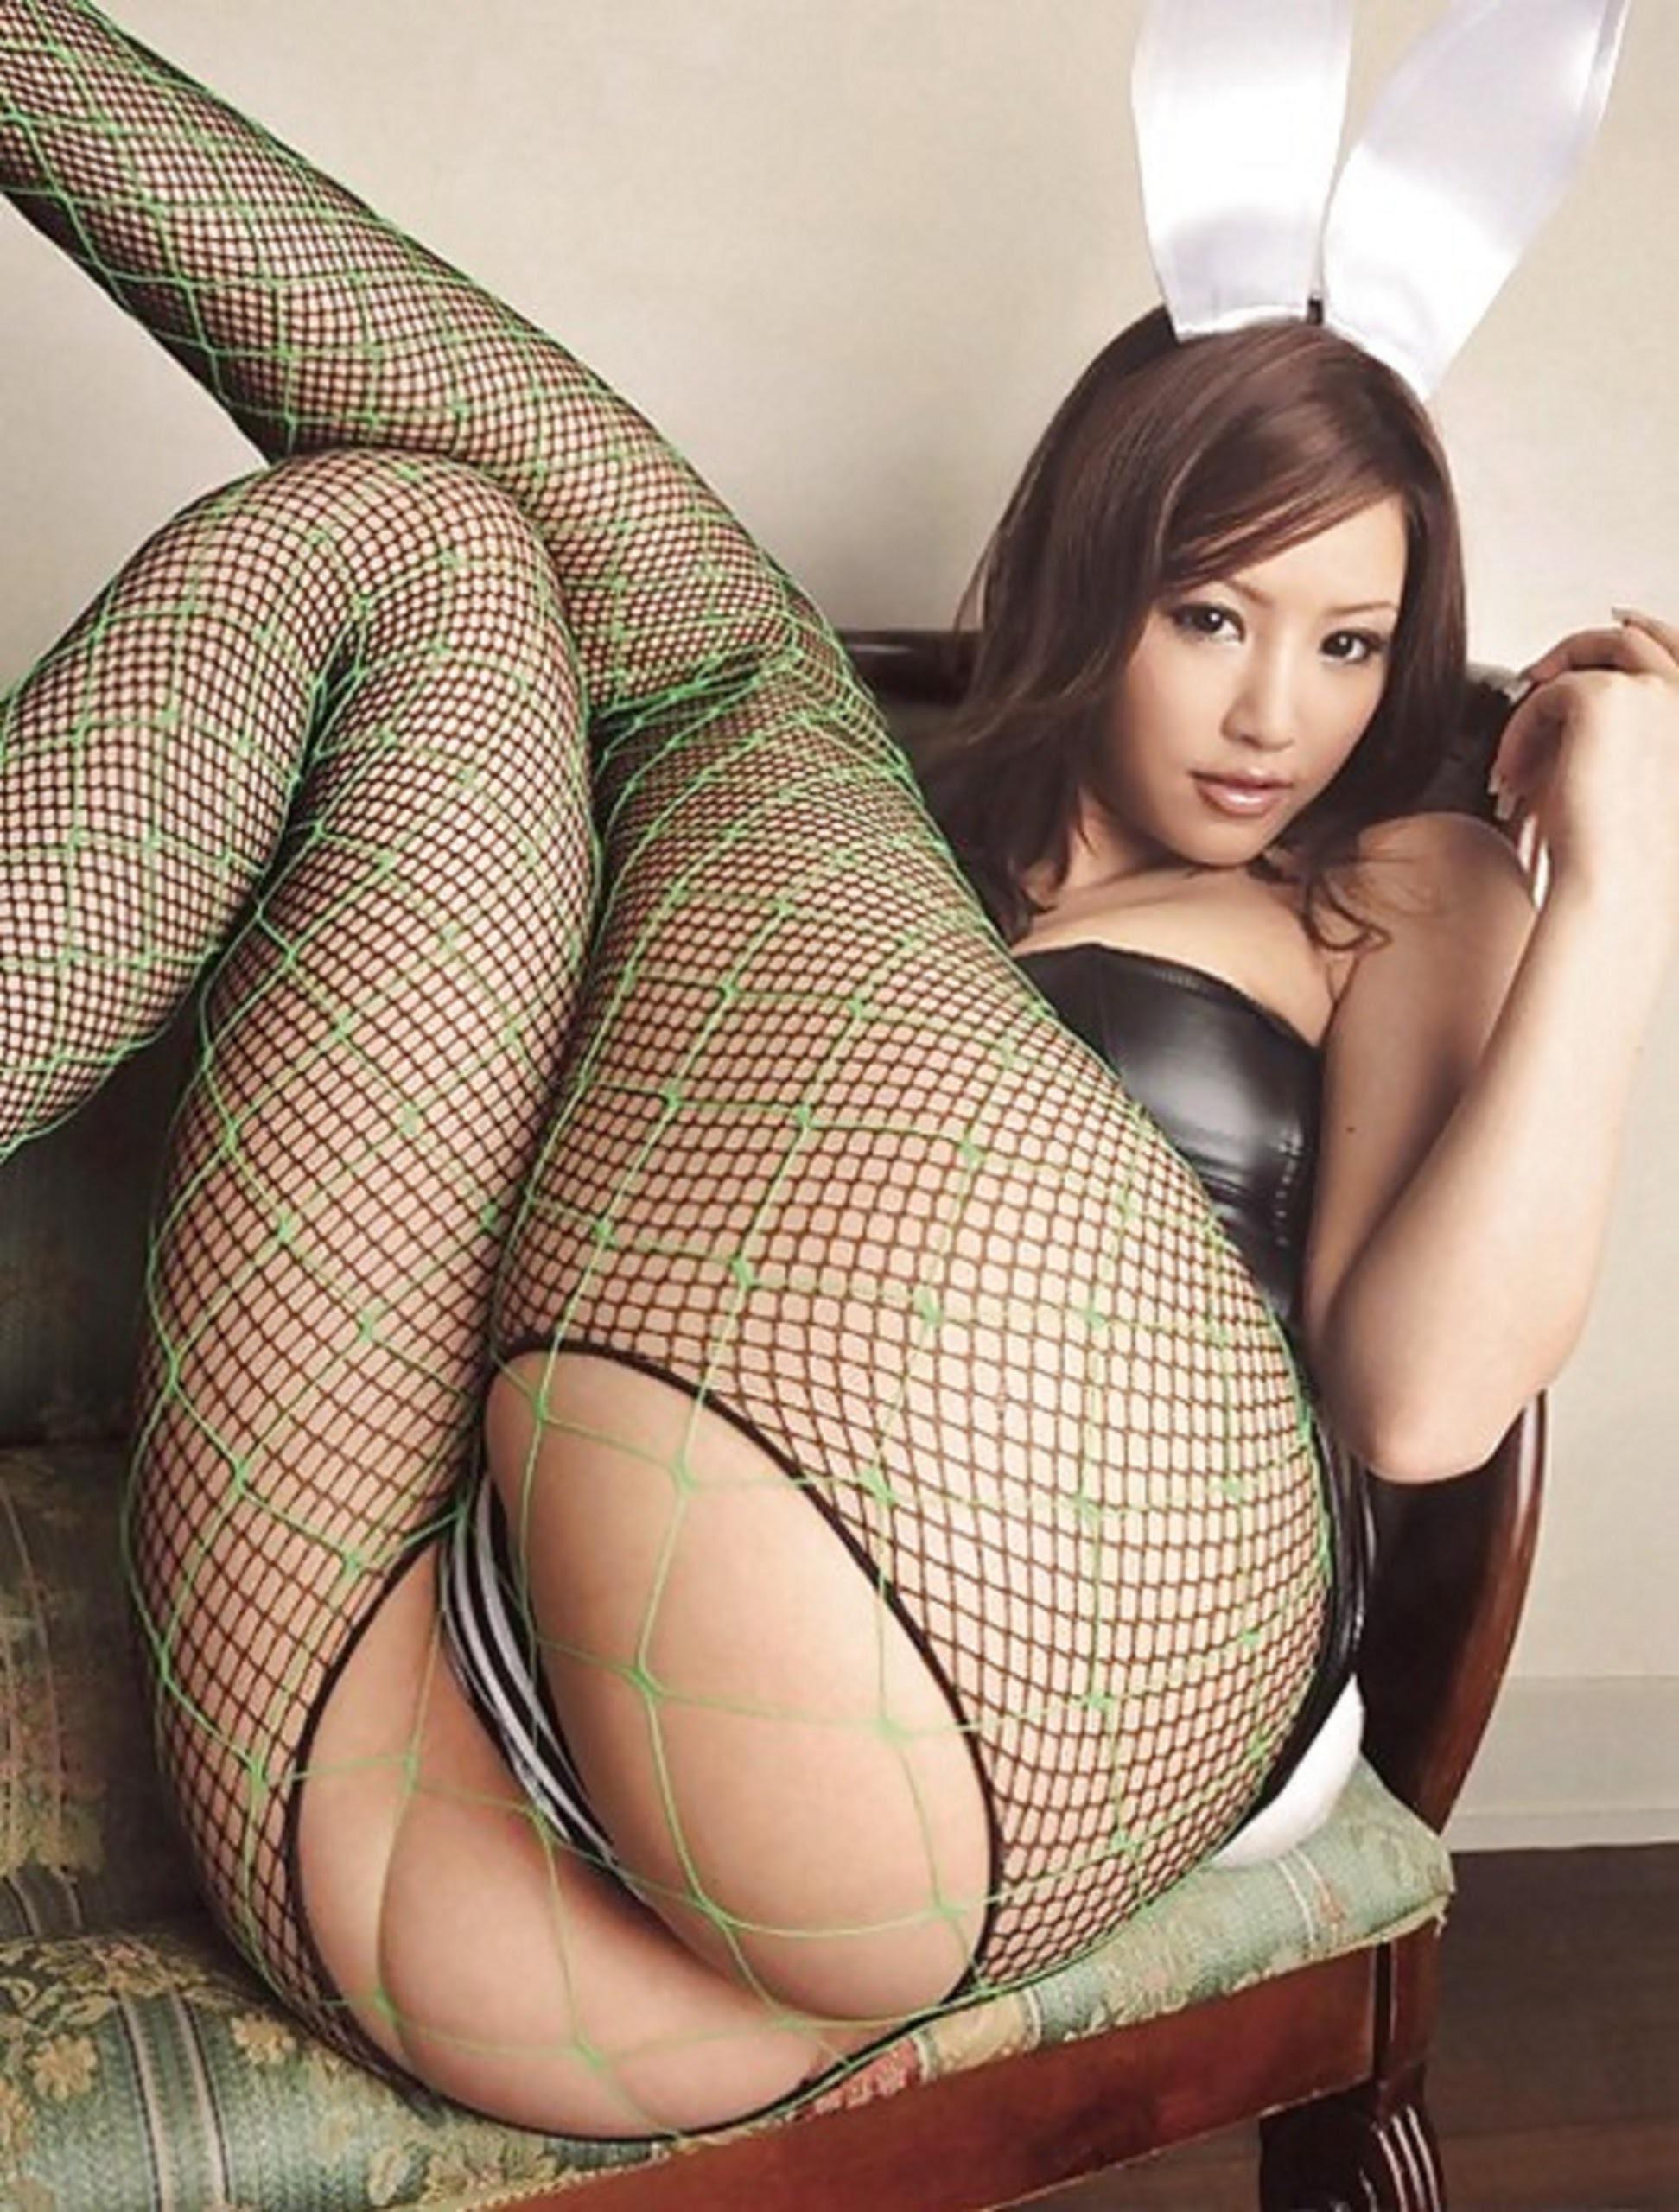 riley reid sex video in riley reid big black cock massage